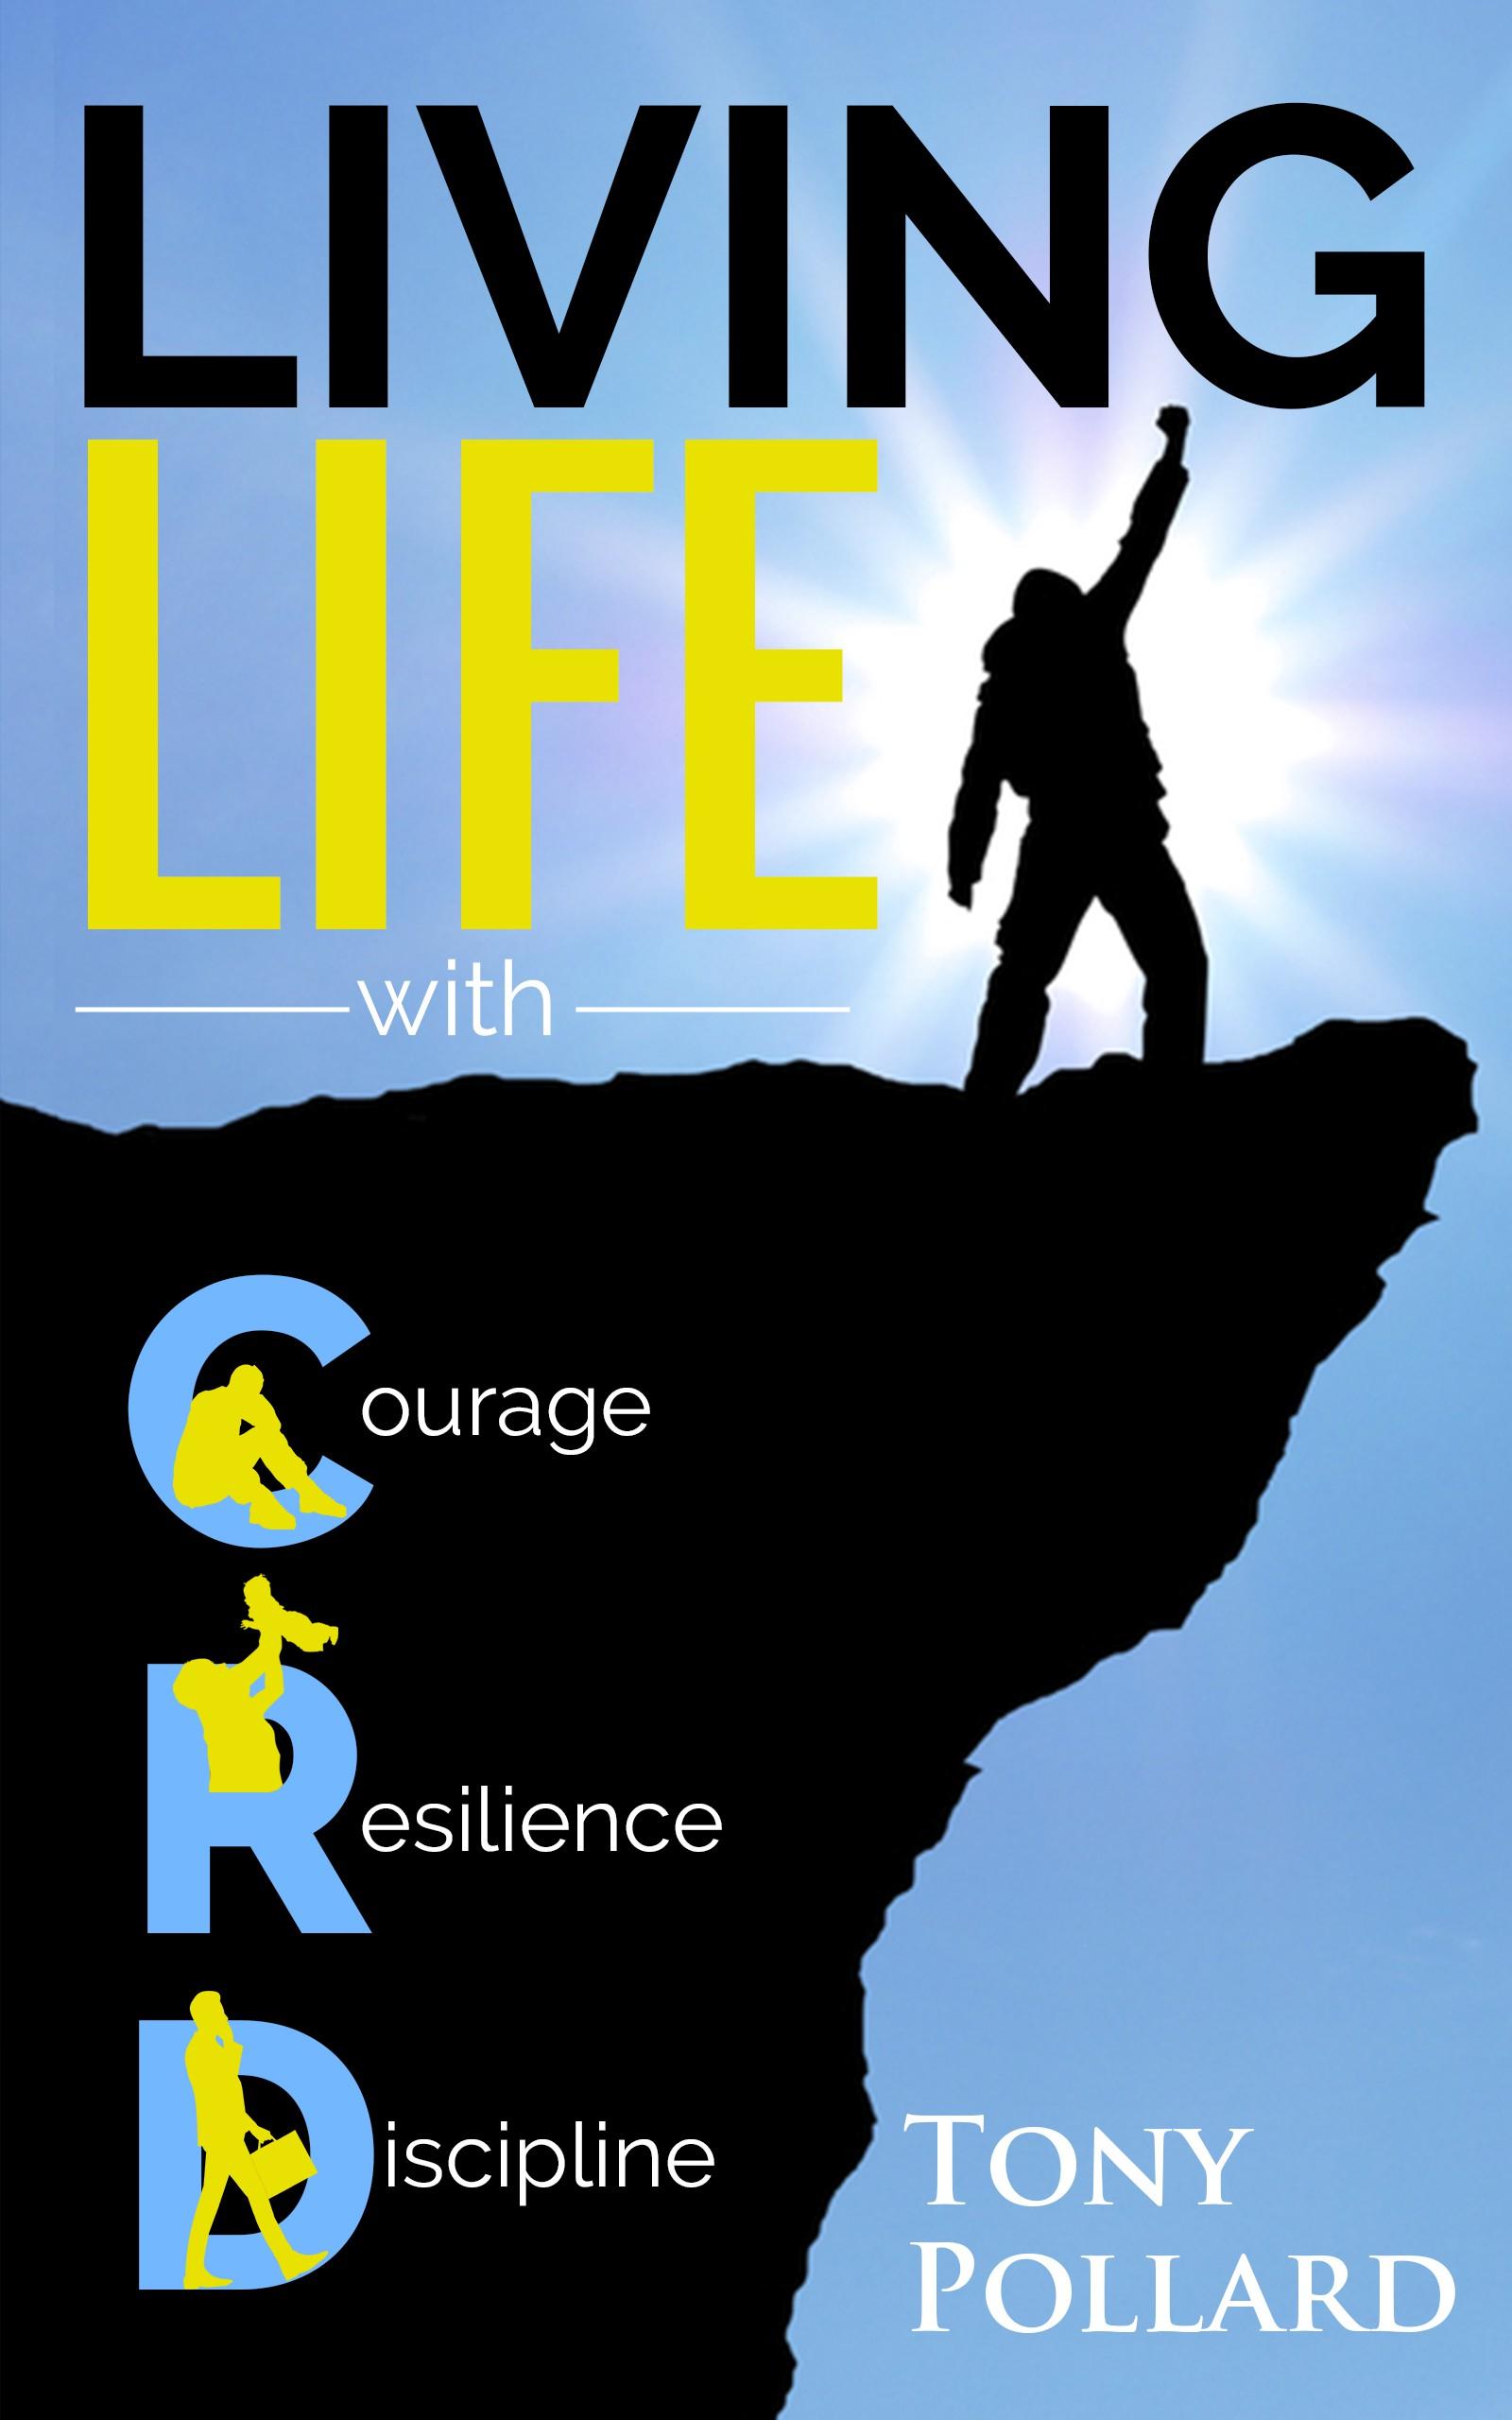 Aspiring motivational speaker needs to ignite, excite, and inspire